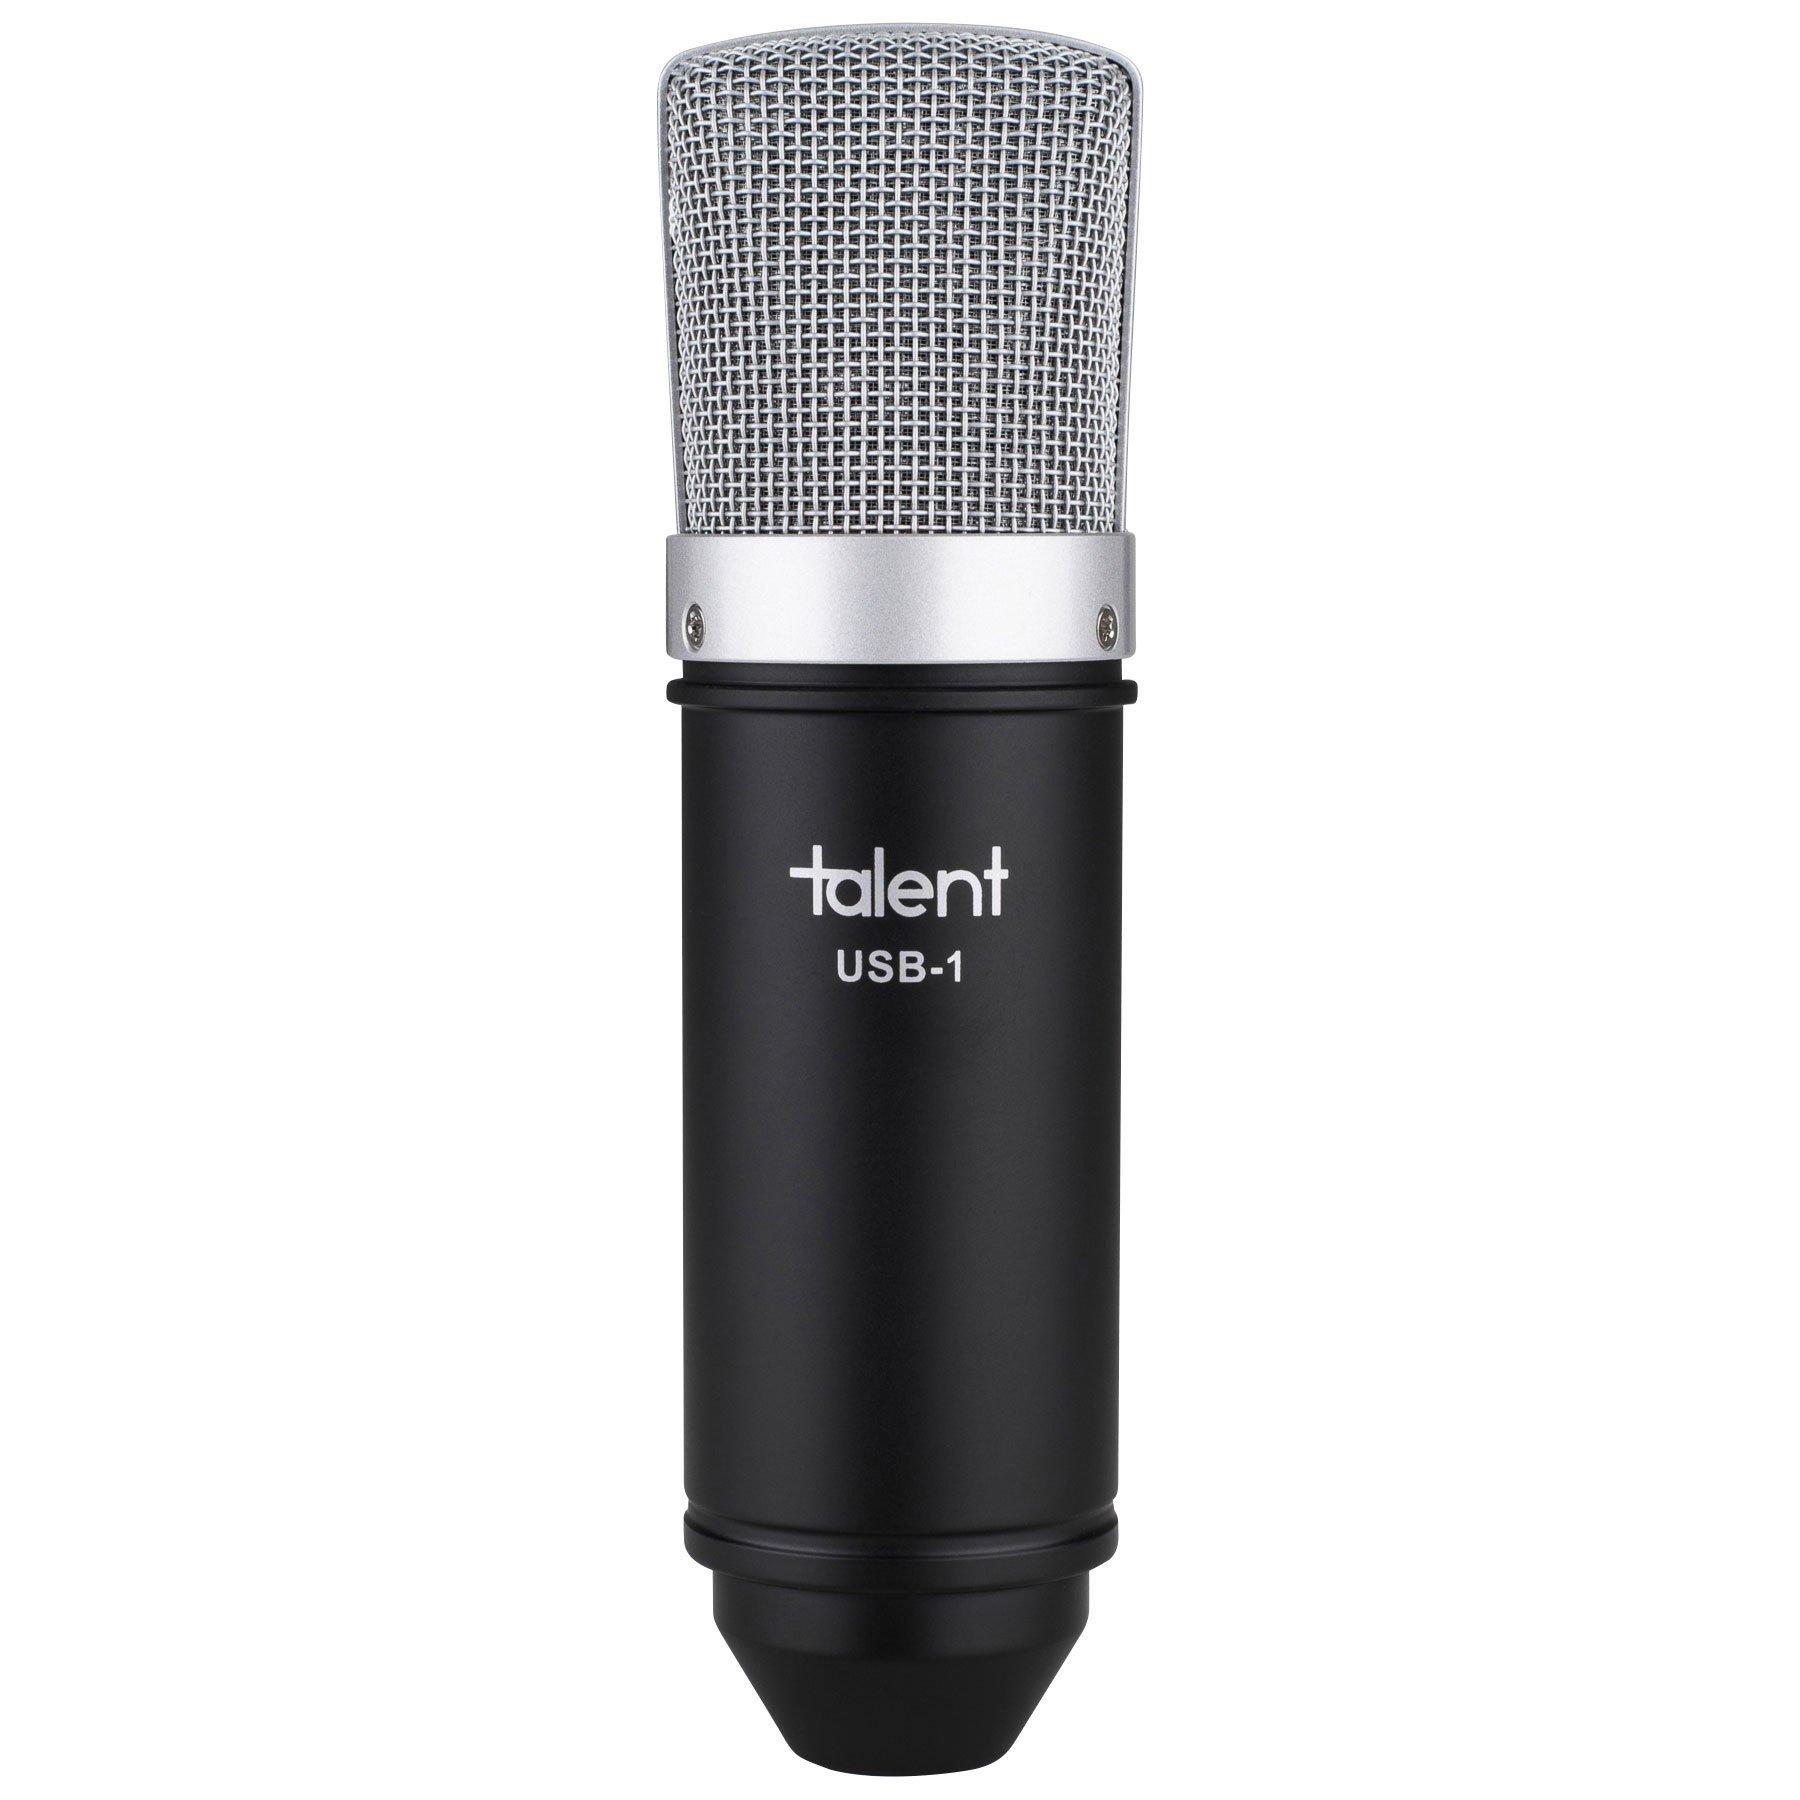 Talent USB-1 Studio Condensador Micrófono USB con trípode - Montaje de choque - Cable USB